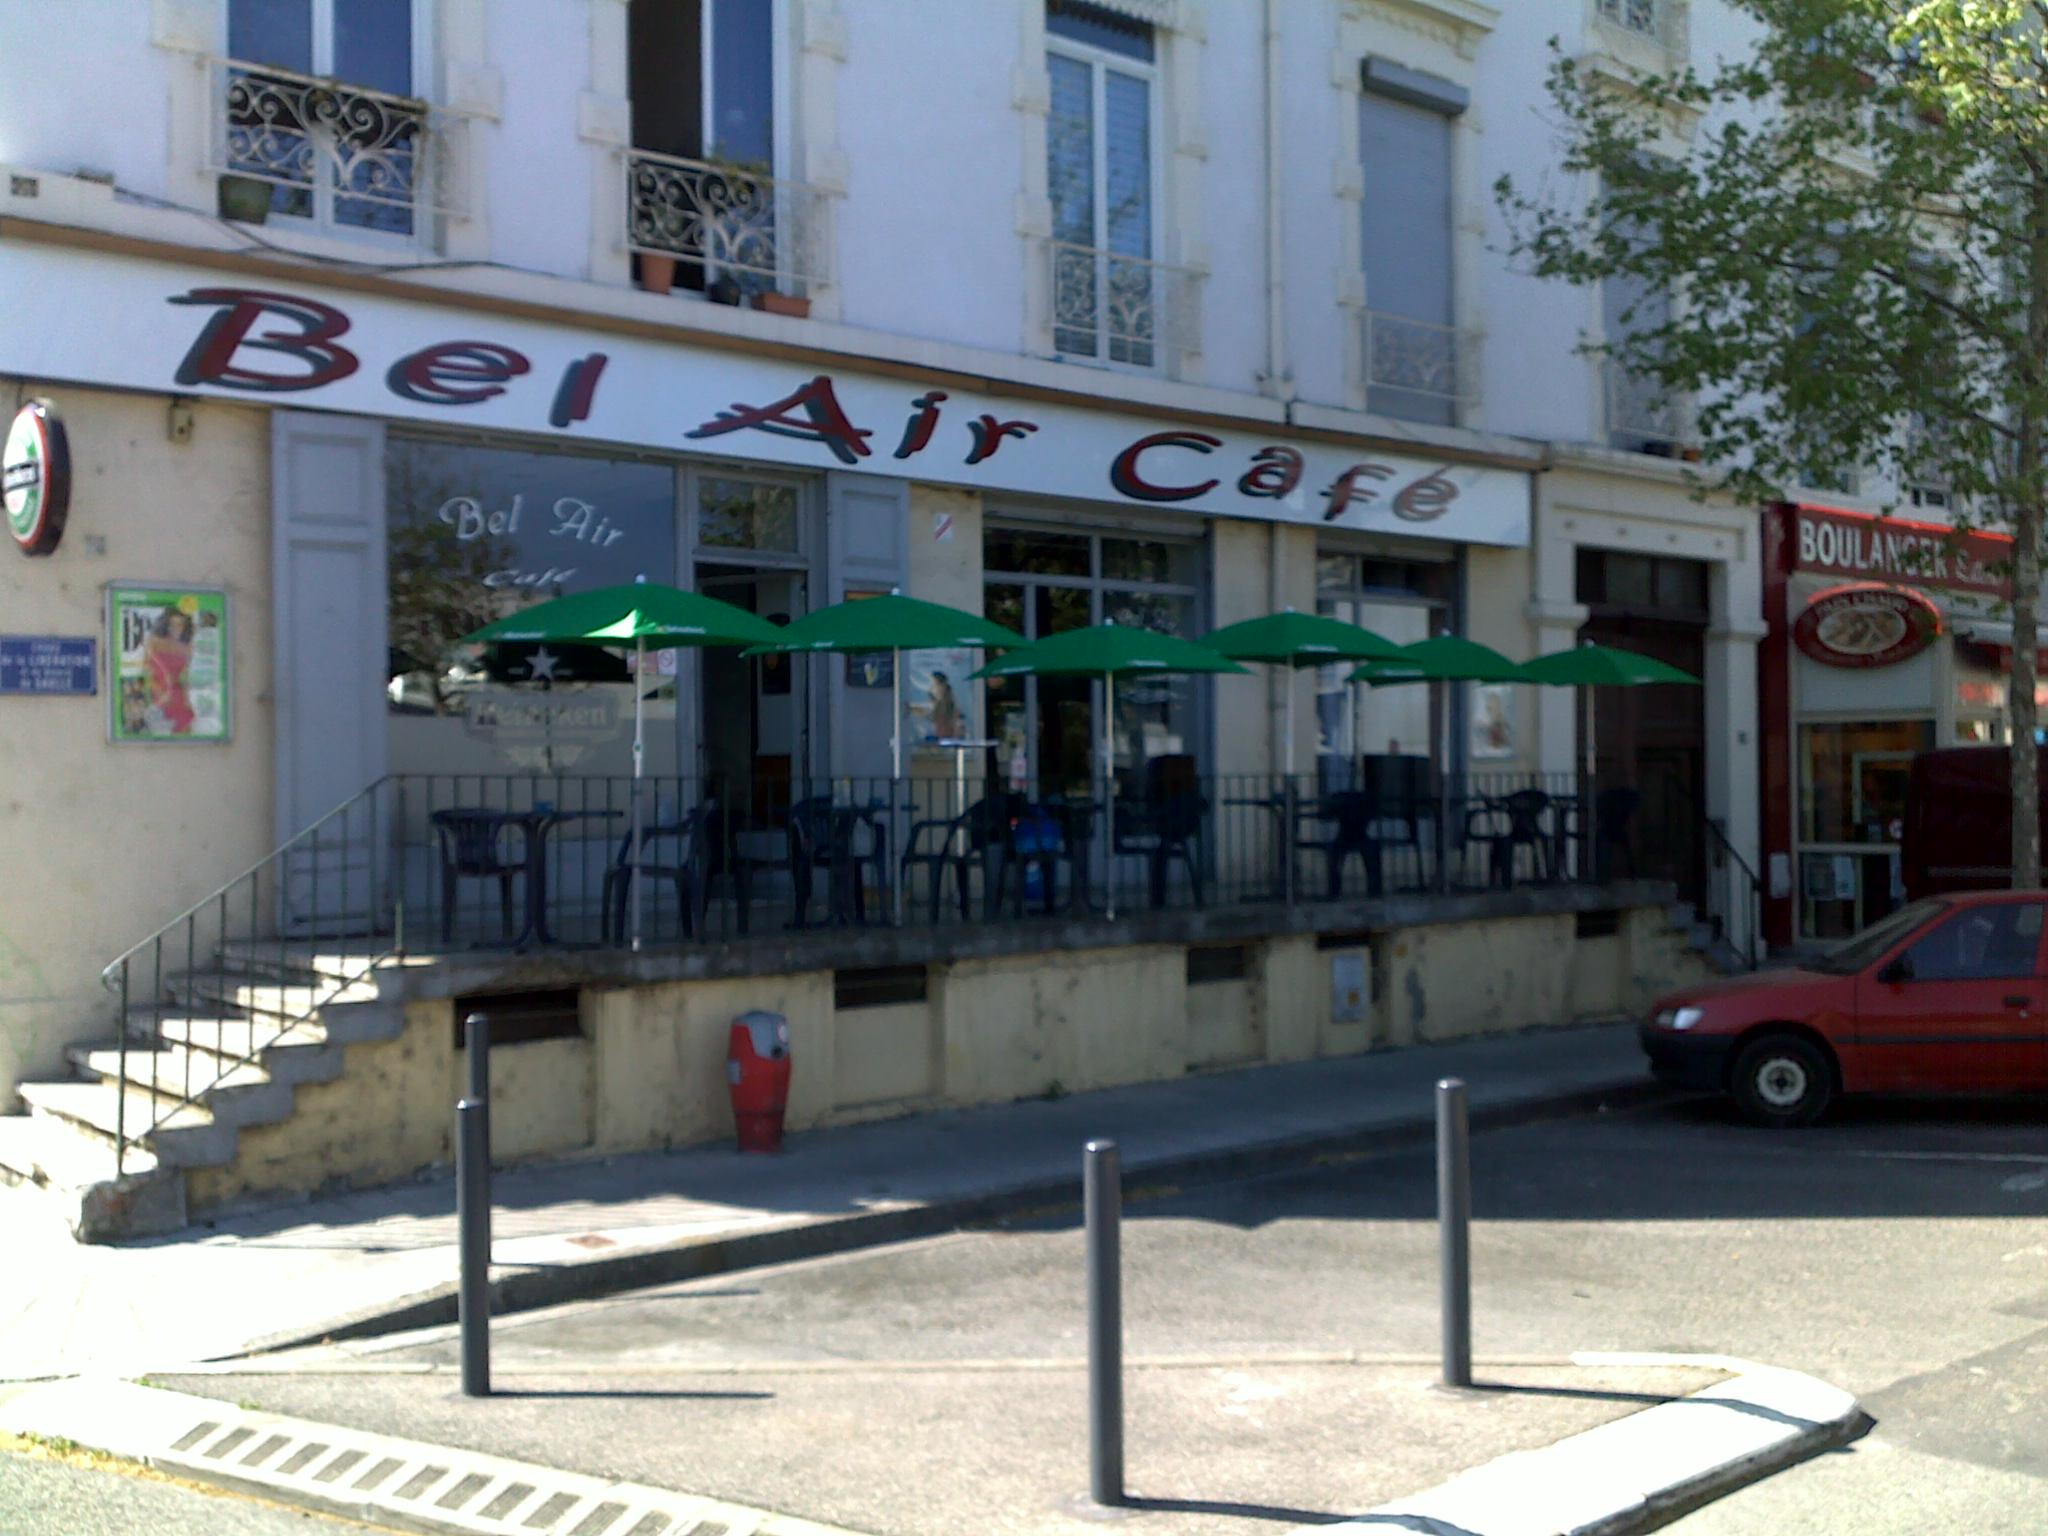 Restaurant Au Prestige Dauphinois Grenoble